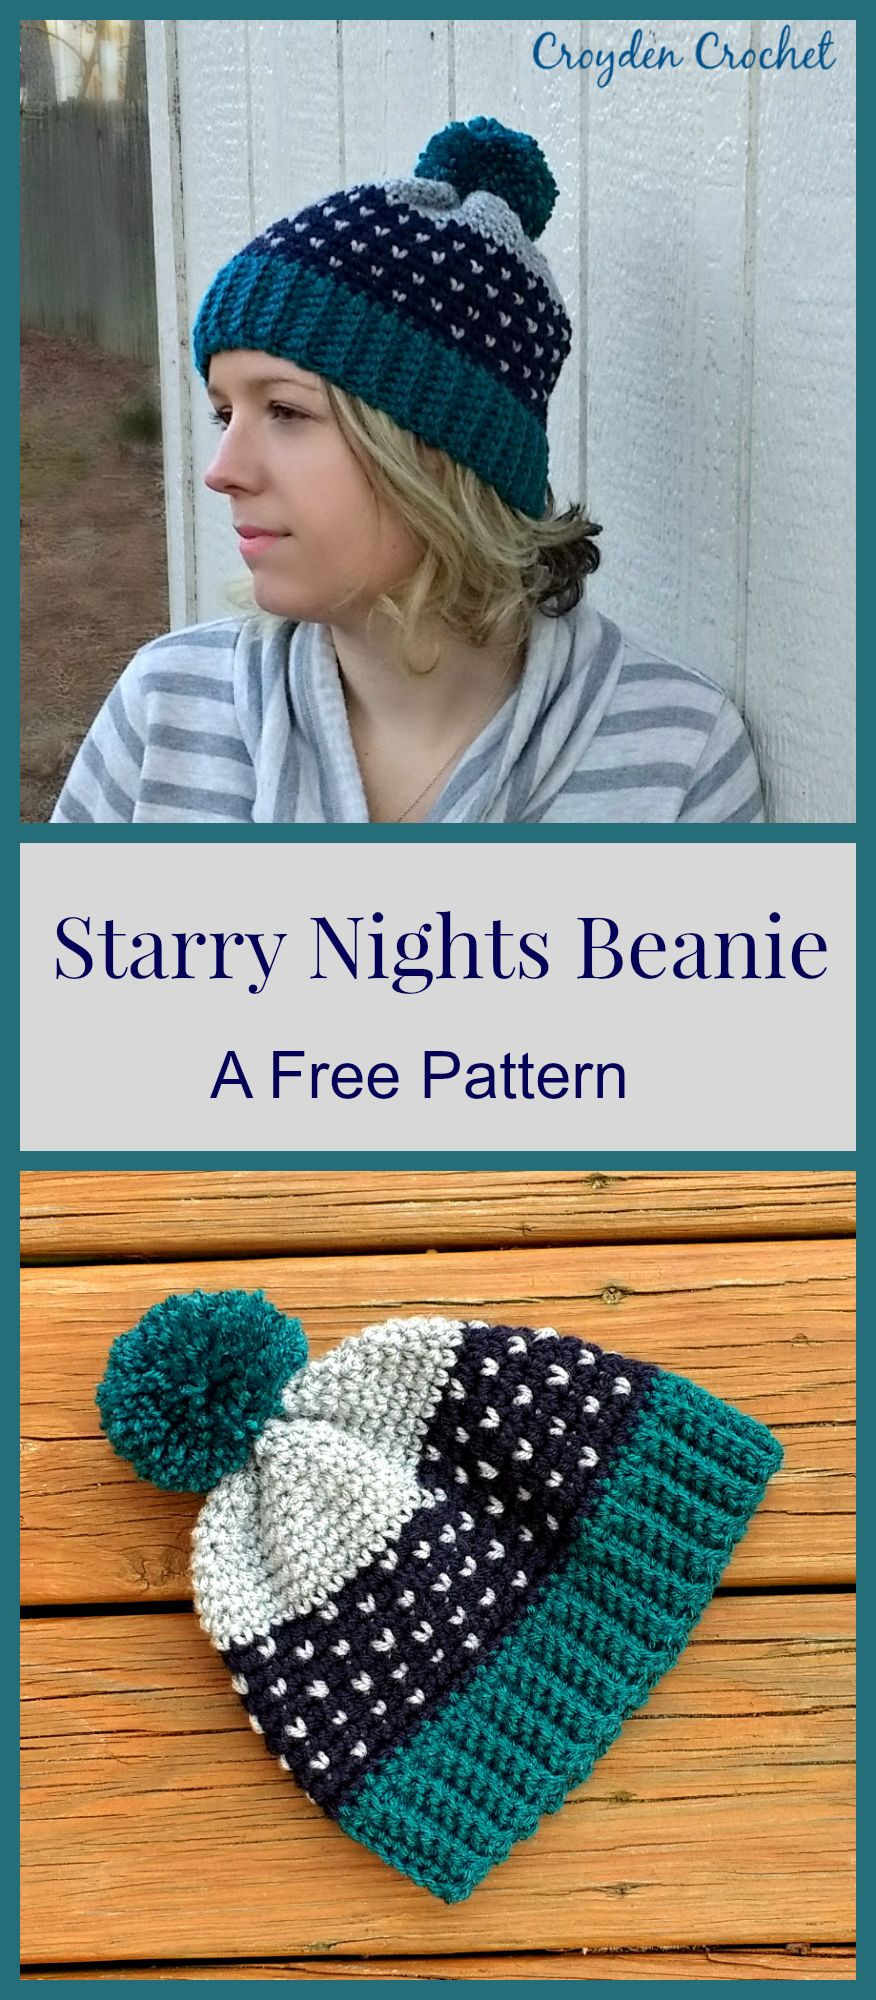 Starry Nights Beanie - Croyden Crochet - (free pattern) | Gorros ...